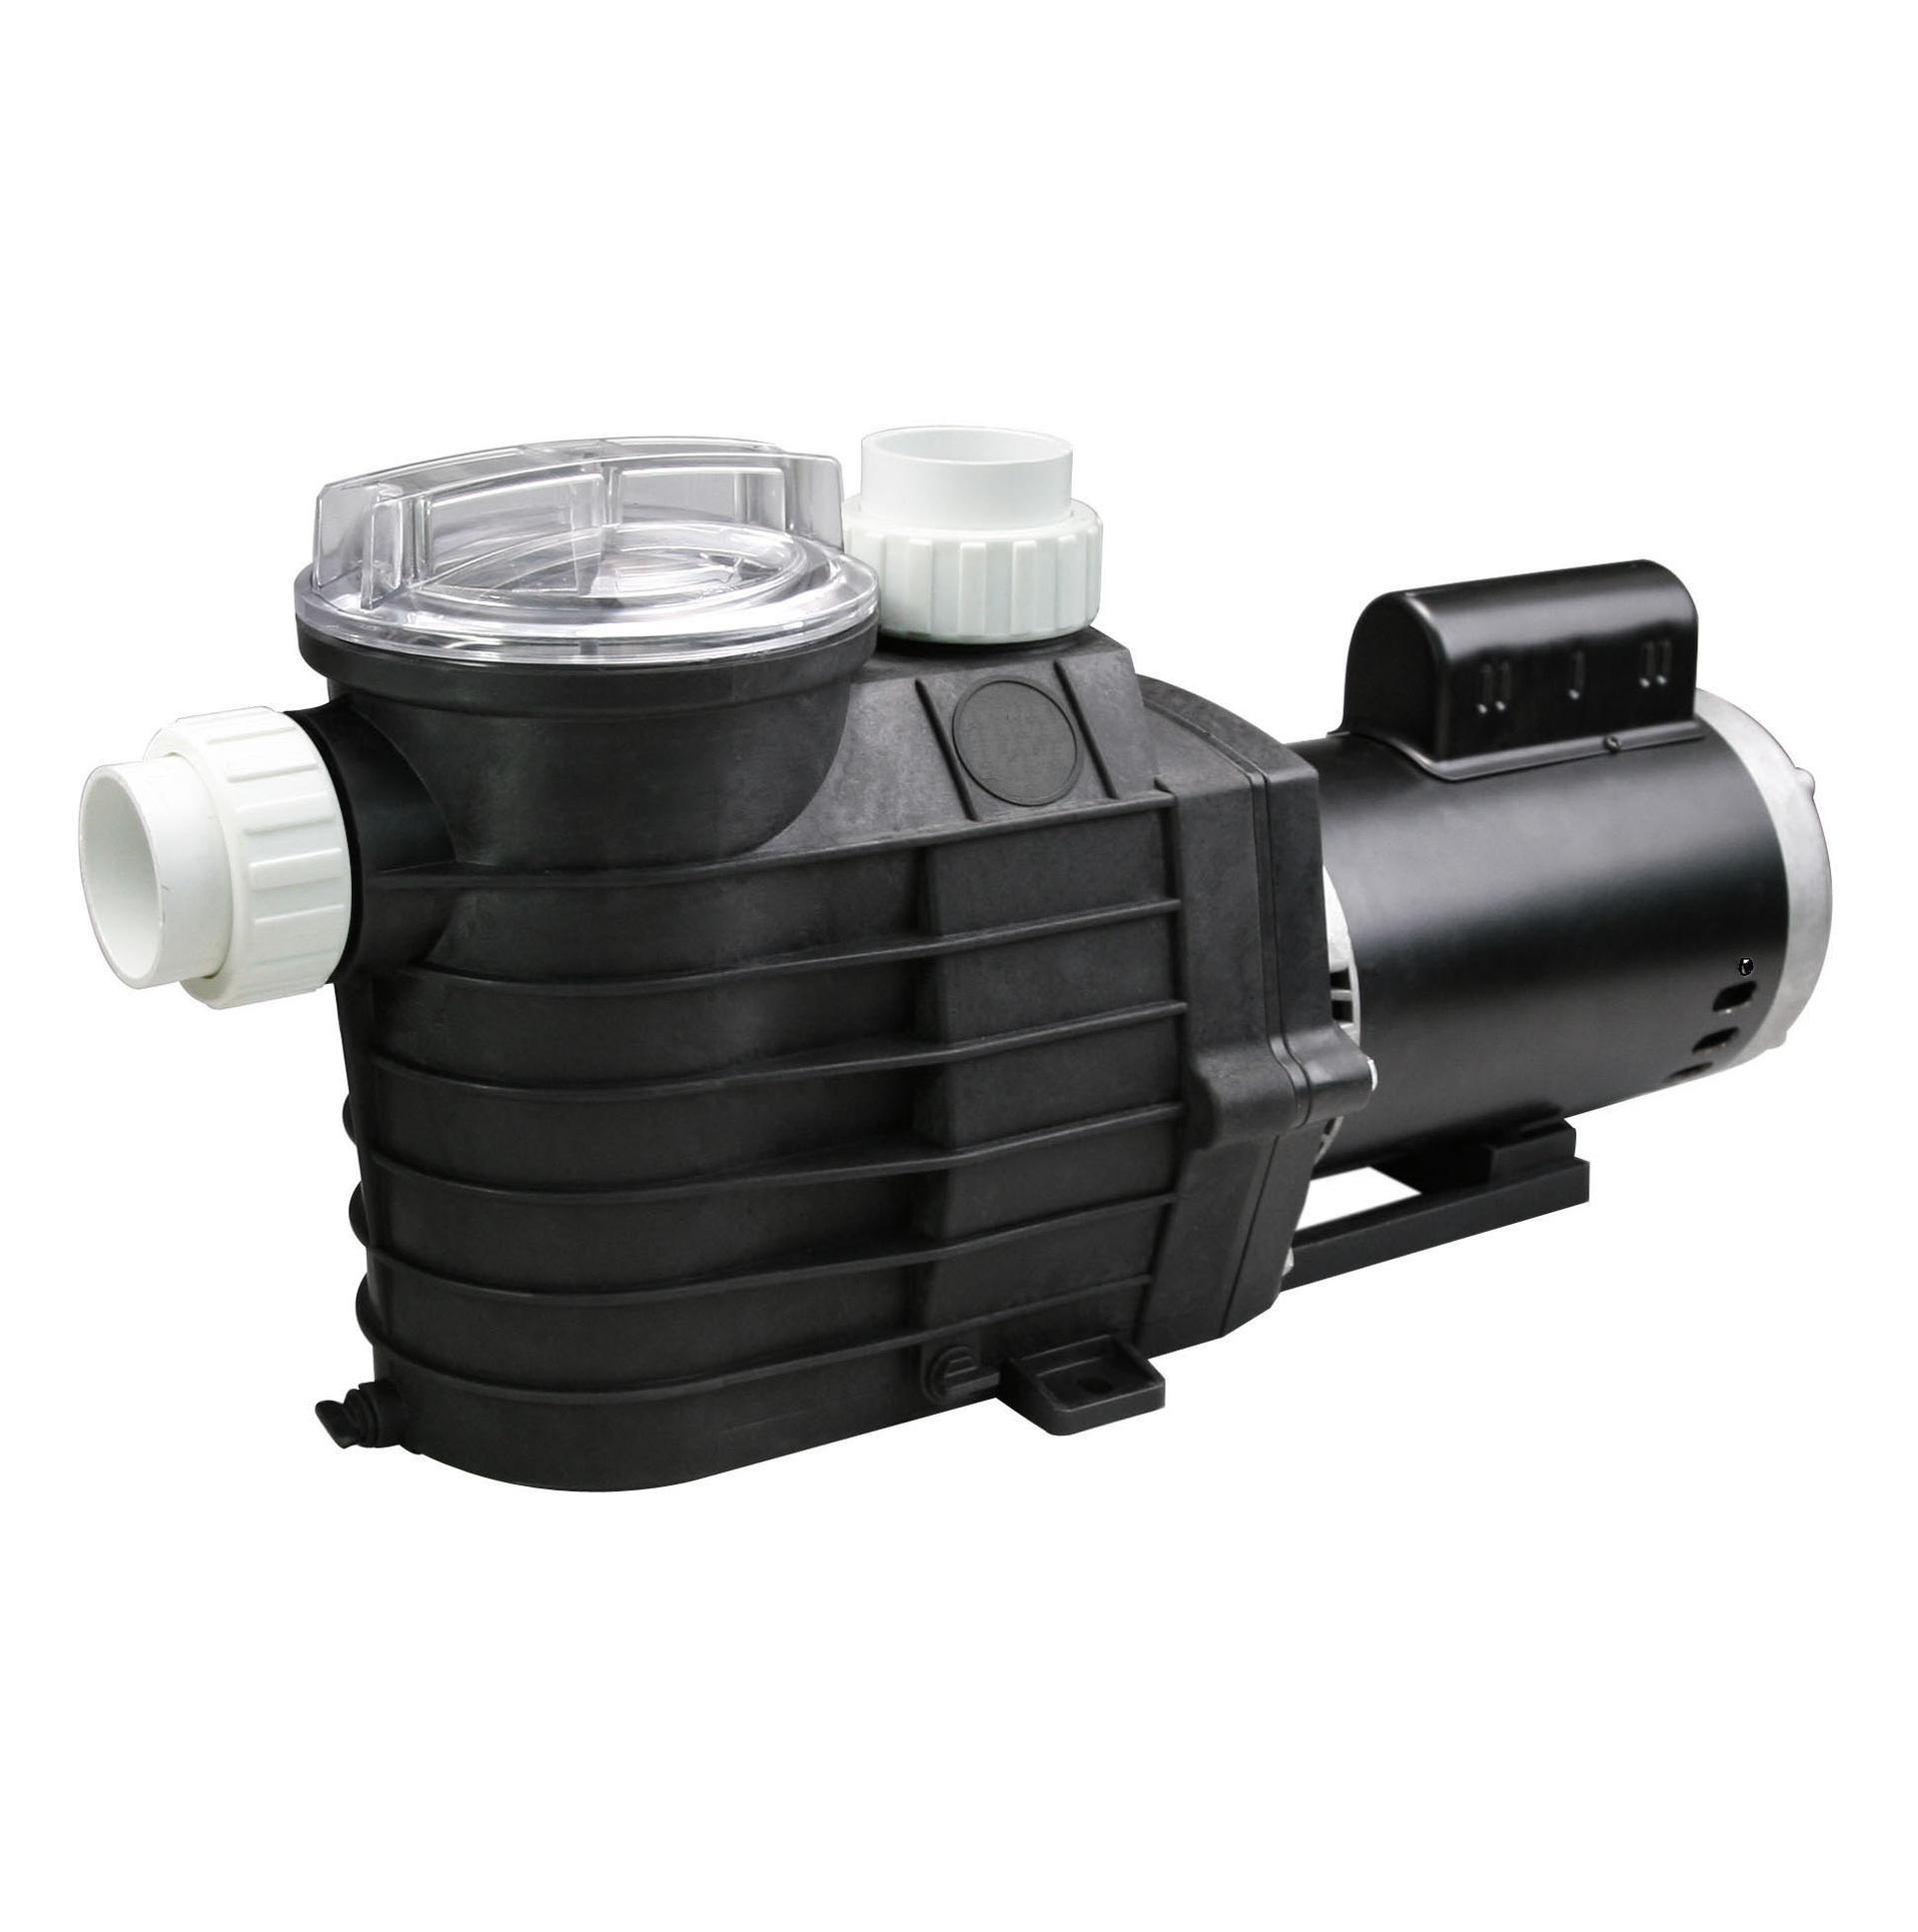 Swimming pool pump Circulation for 48SUP0753C-I